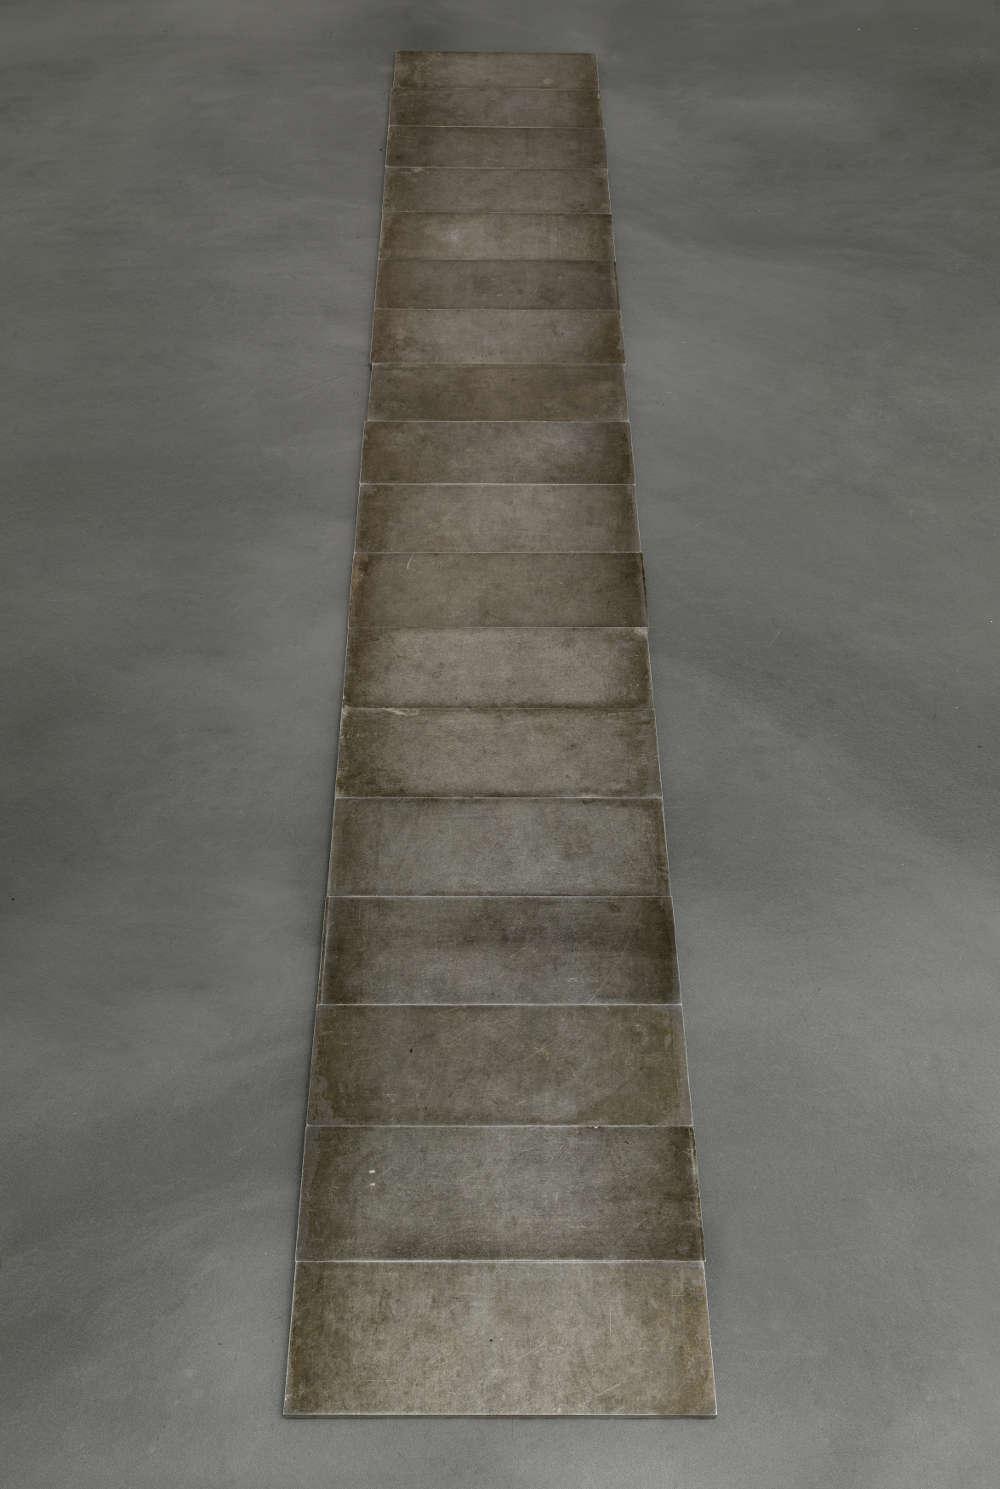 Carl Andre, 18 Aluminum Row, 1968. Aluminium in 18 units Each: 1.2 x 39 x 13.9 cm (1/2 x 15 3/8 x 5 1/2 in.) Overall: 1.2 x 39 x 251.4 cm (1/2 x 15 3/8 x 99 in.) Courtesy the artist and Simon Lee Gallery, London